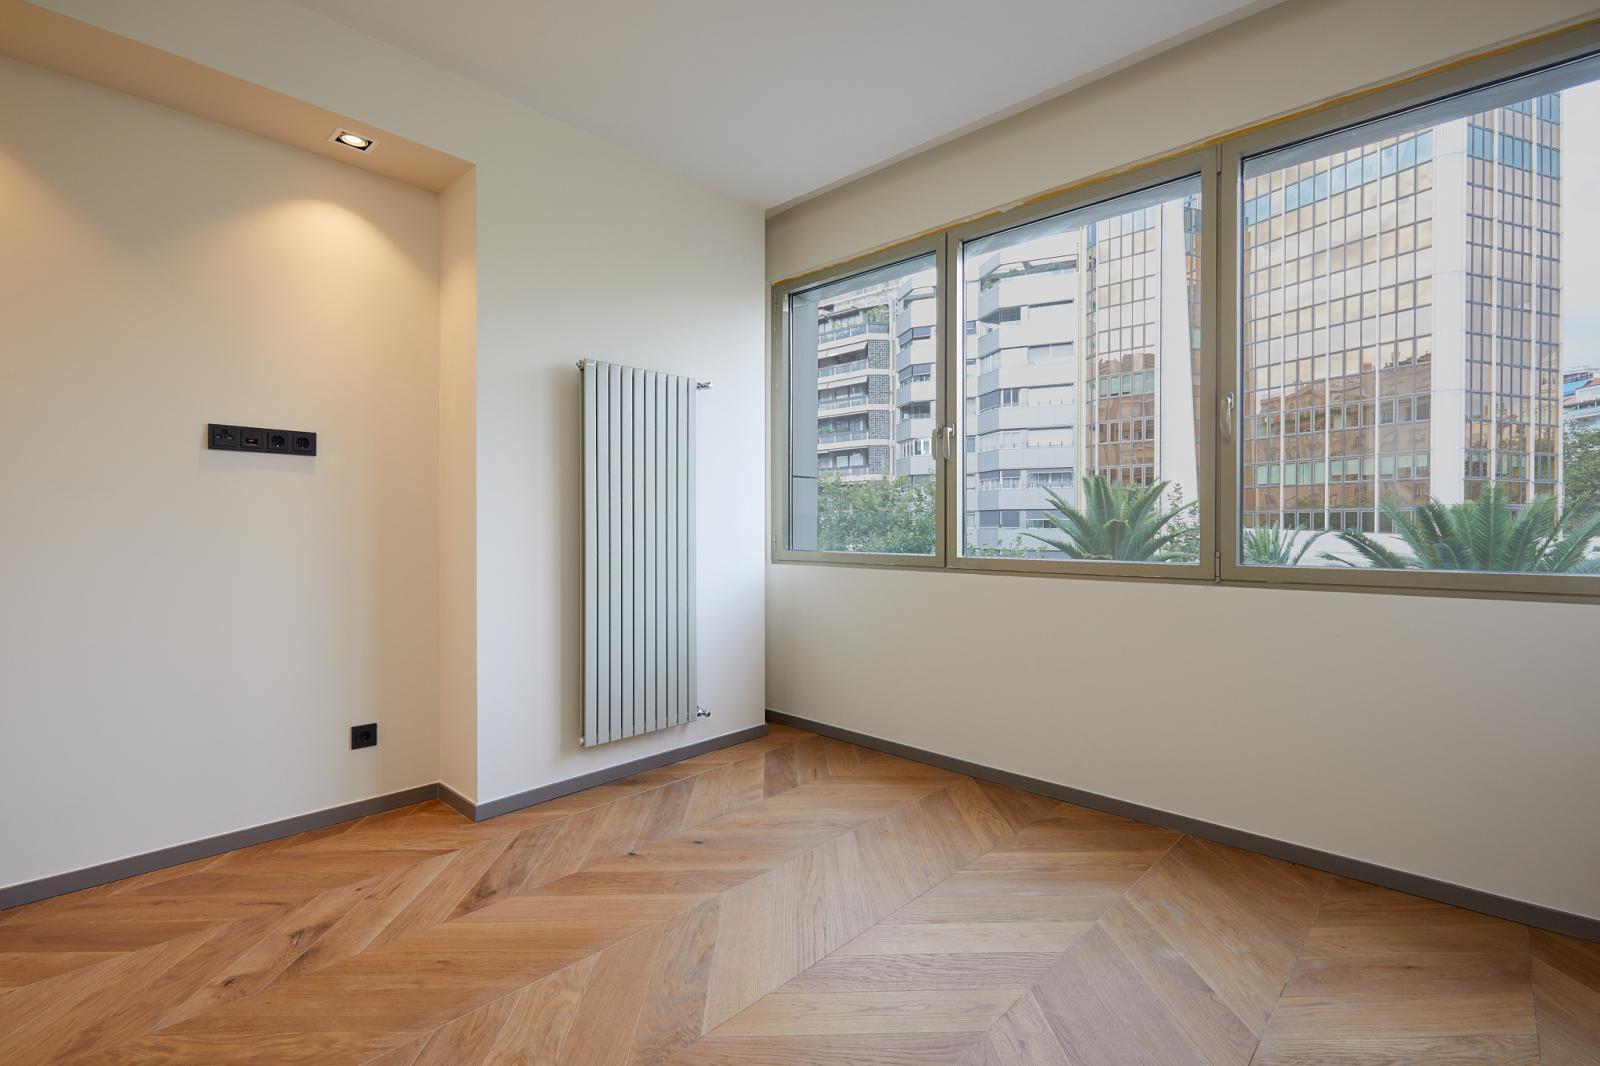 MG Inmobiliaria Barcelona - josep-tarradellas-francec-macia